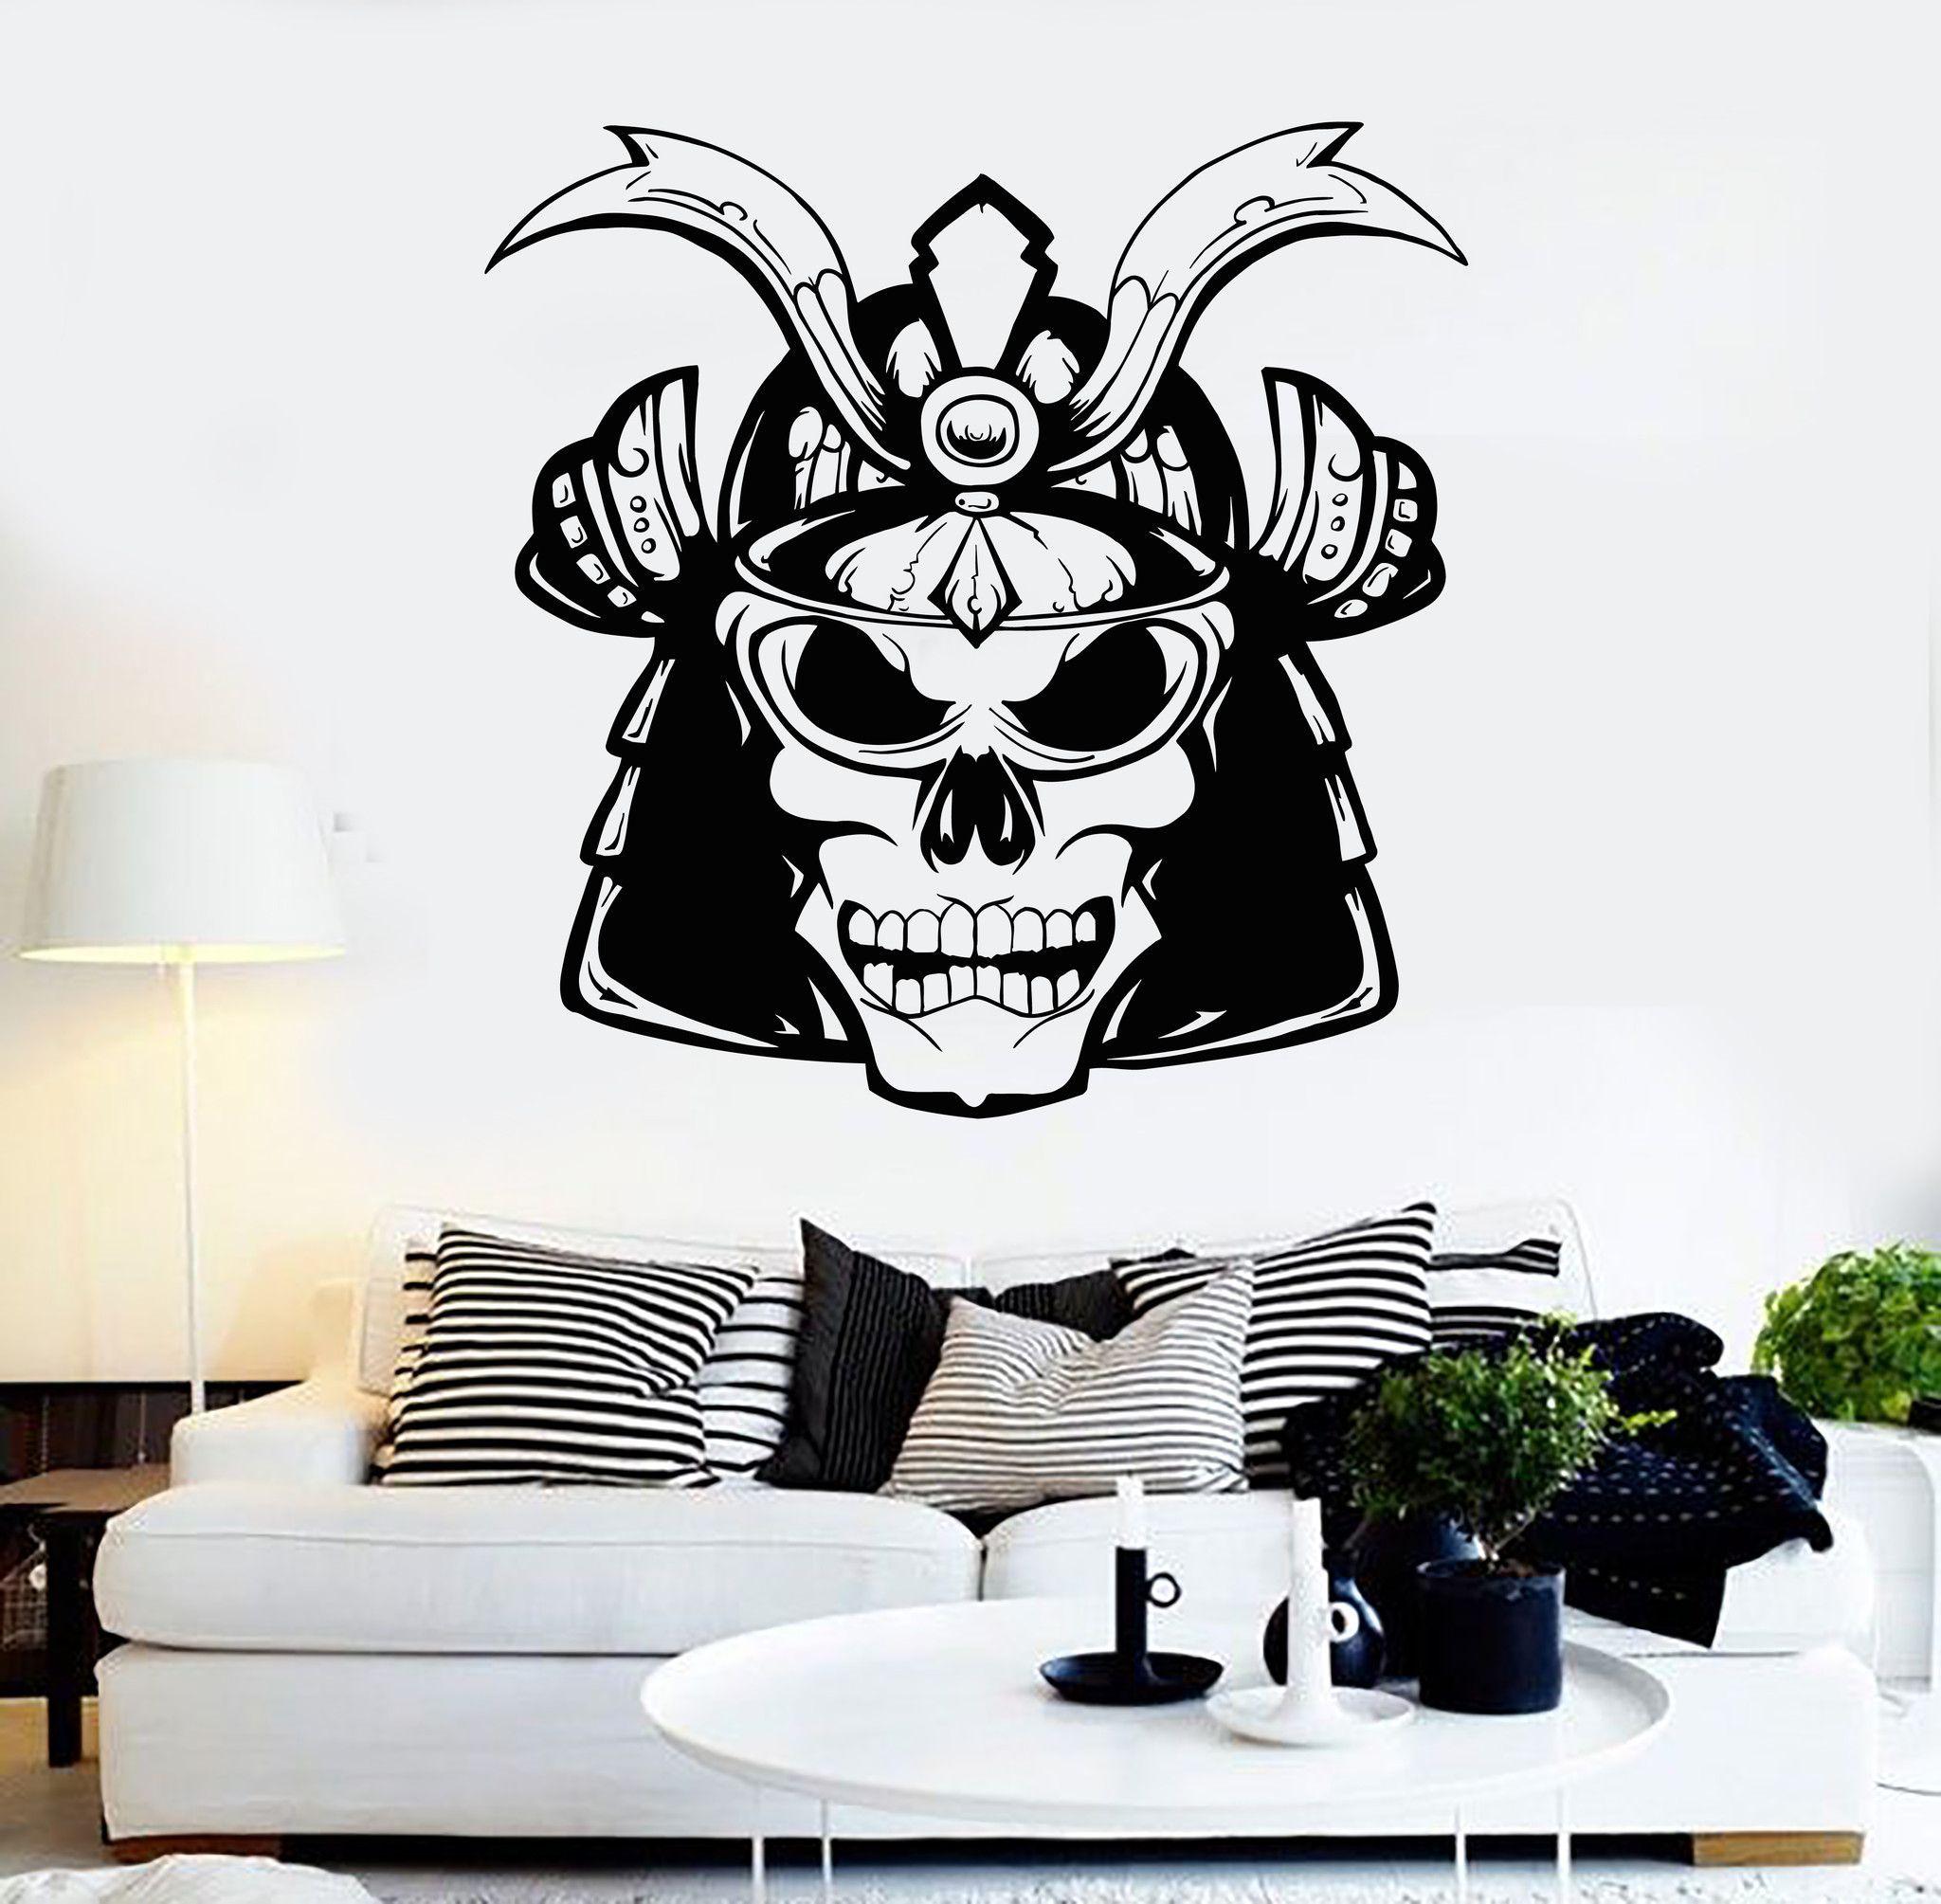 Vinyl Wall Decal Samurai Helmet Skull Asian Style Stickers Mural - Vinyl wall decals asian